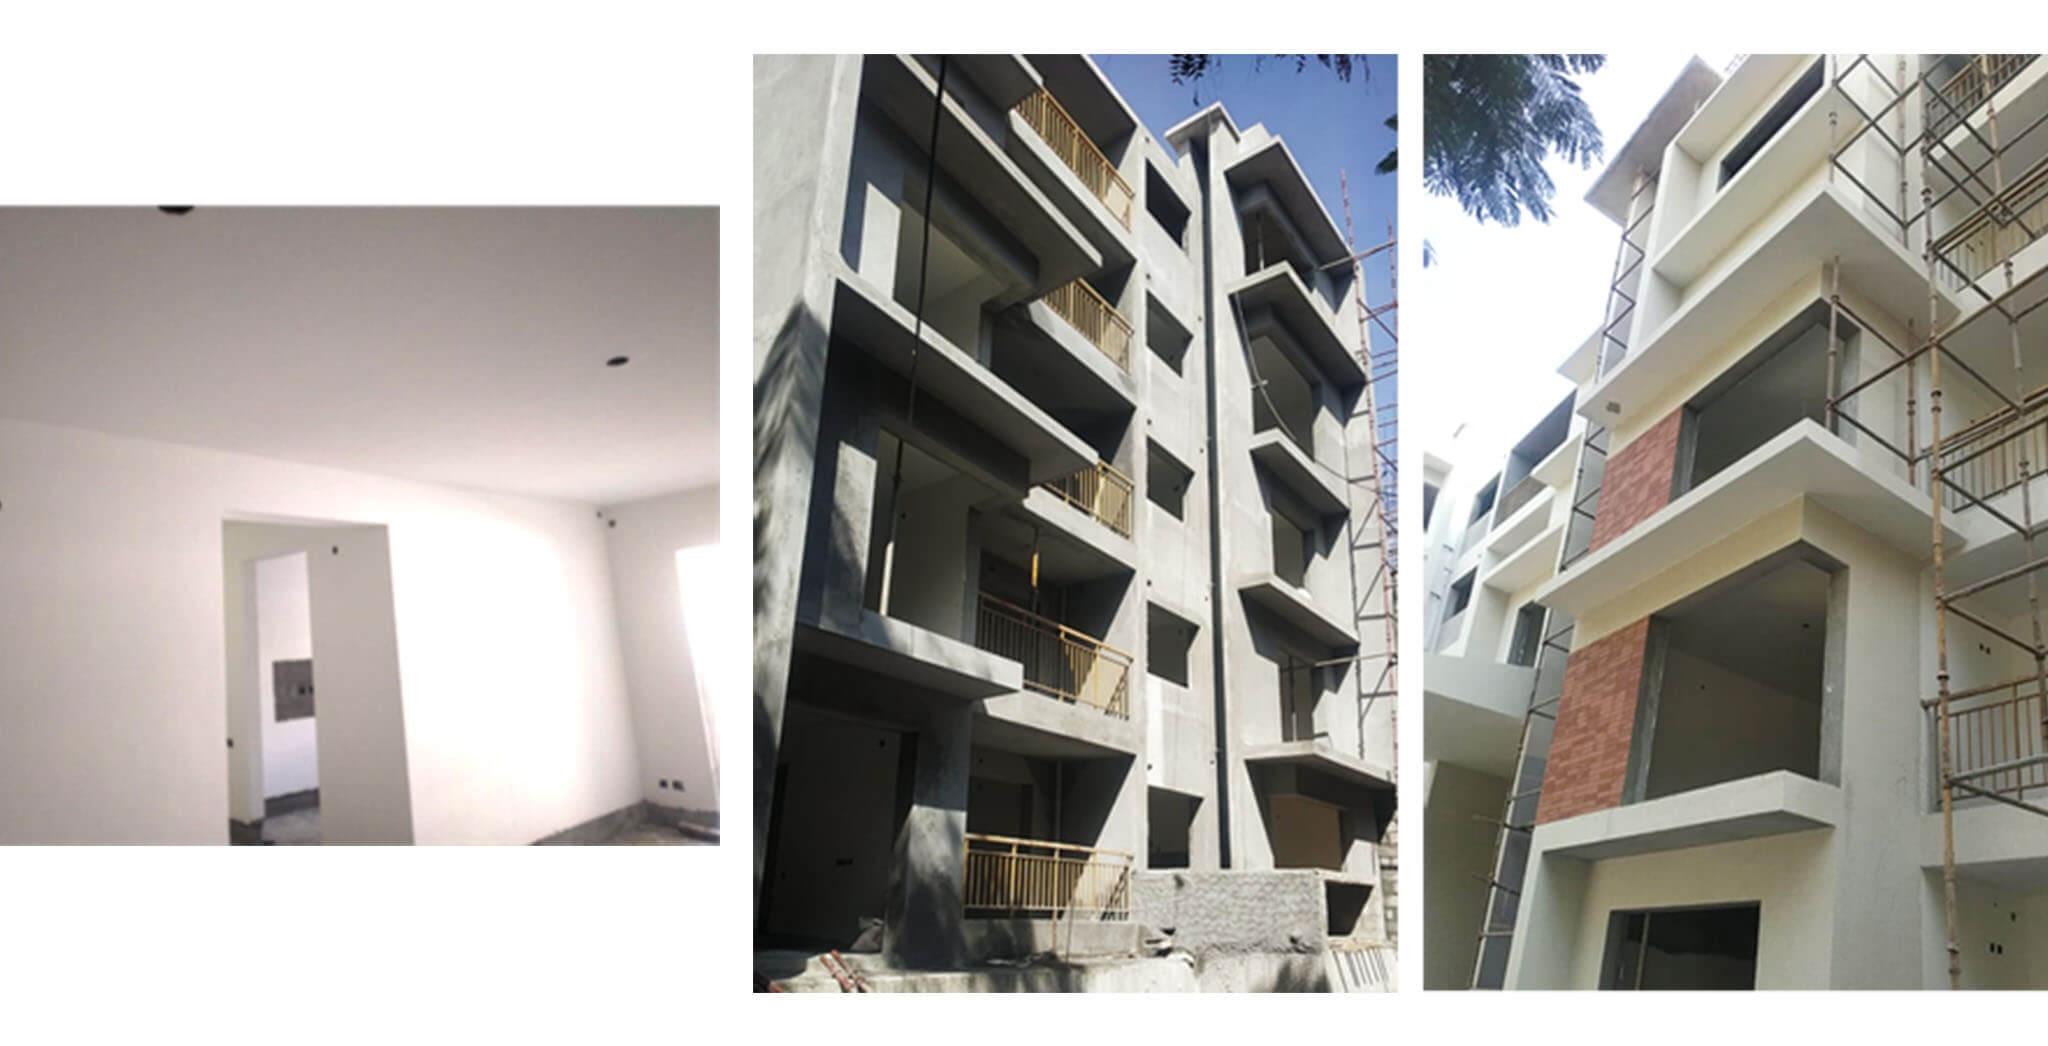 Dec 2020 - E Block: North Elevation external texture and cladding, South Elevation external plastering work-in-progress; Up to 3rd floor internal plastering work completed